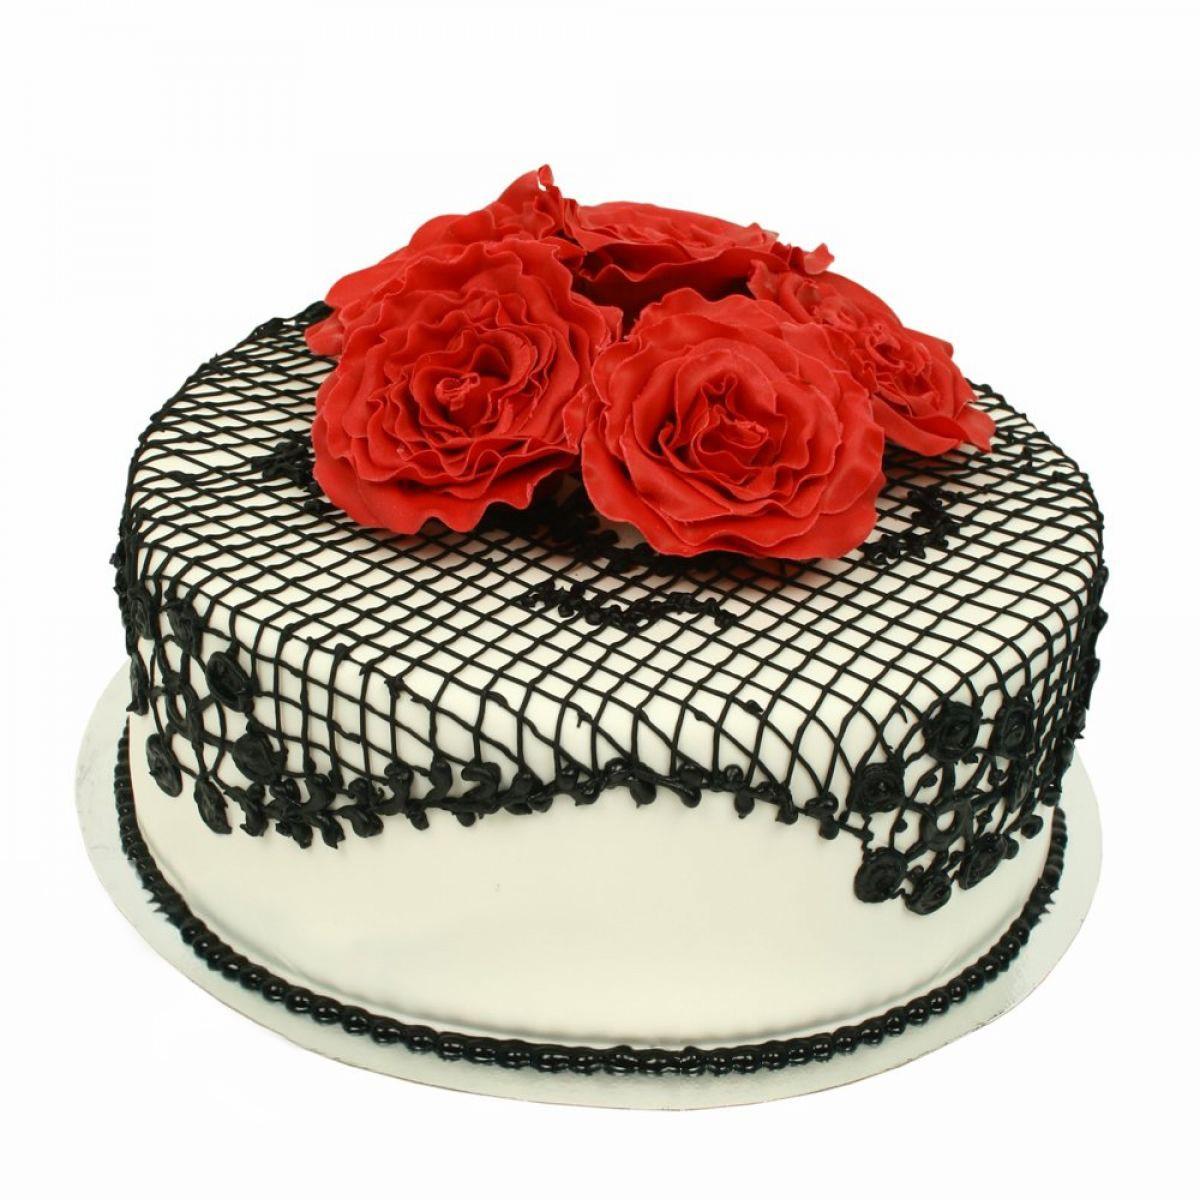 №1423 Торт розы